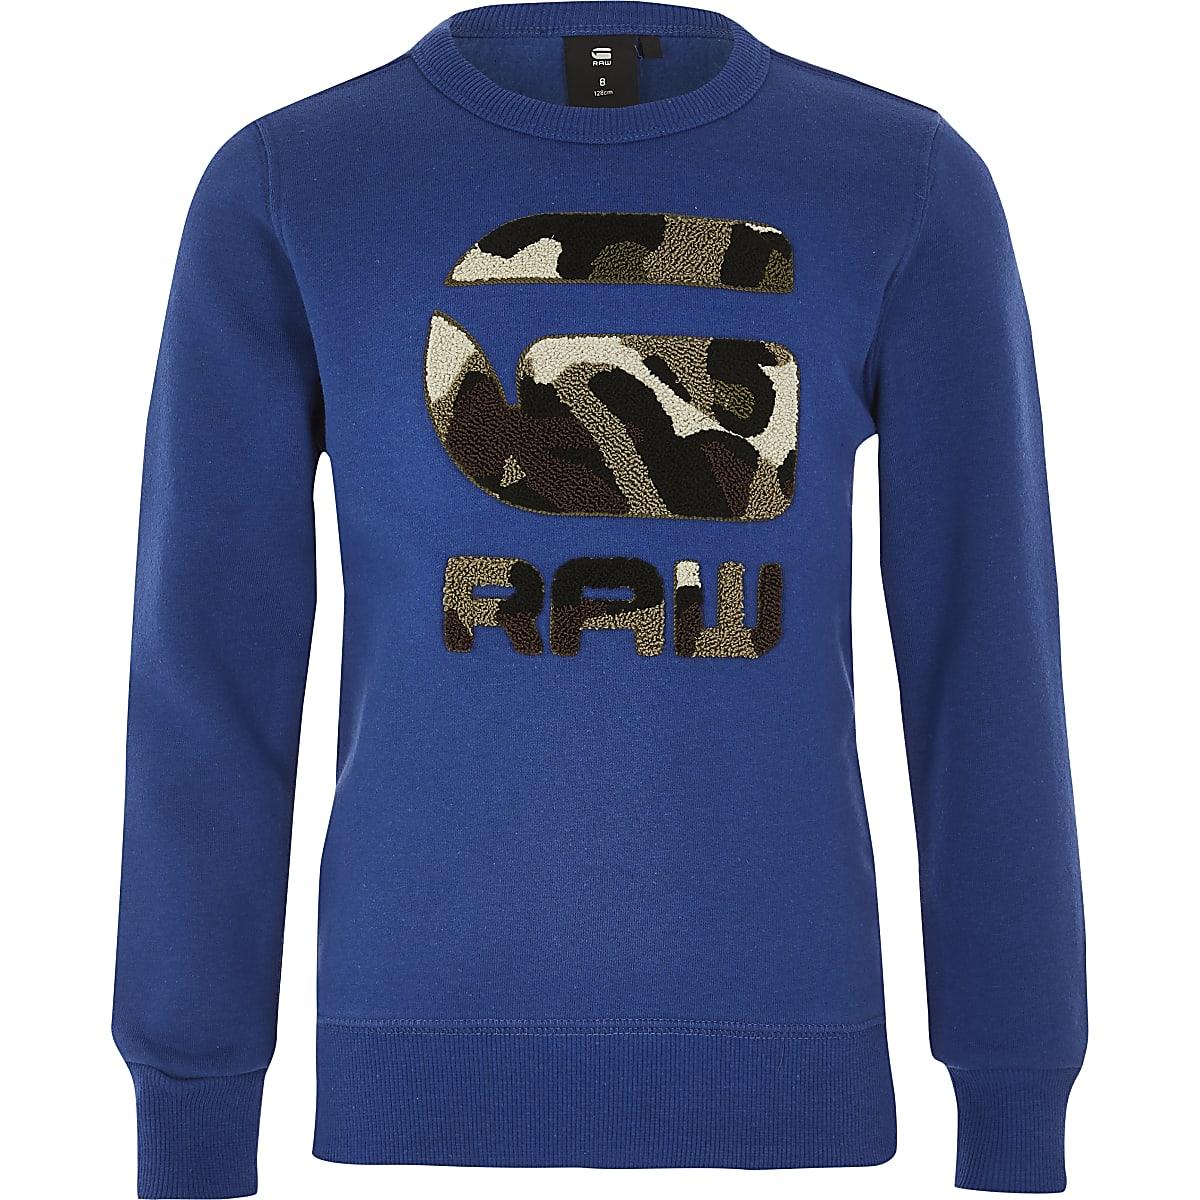 Boys G-Star Raw blue camo print sweatshirt